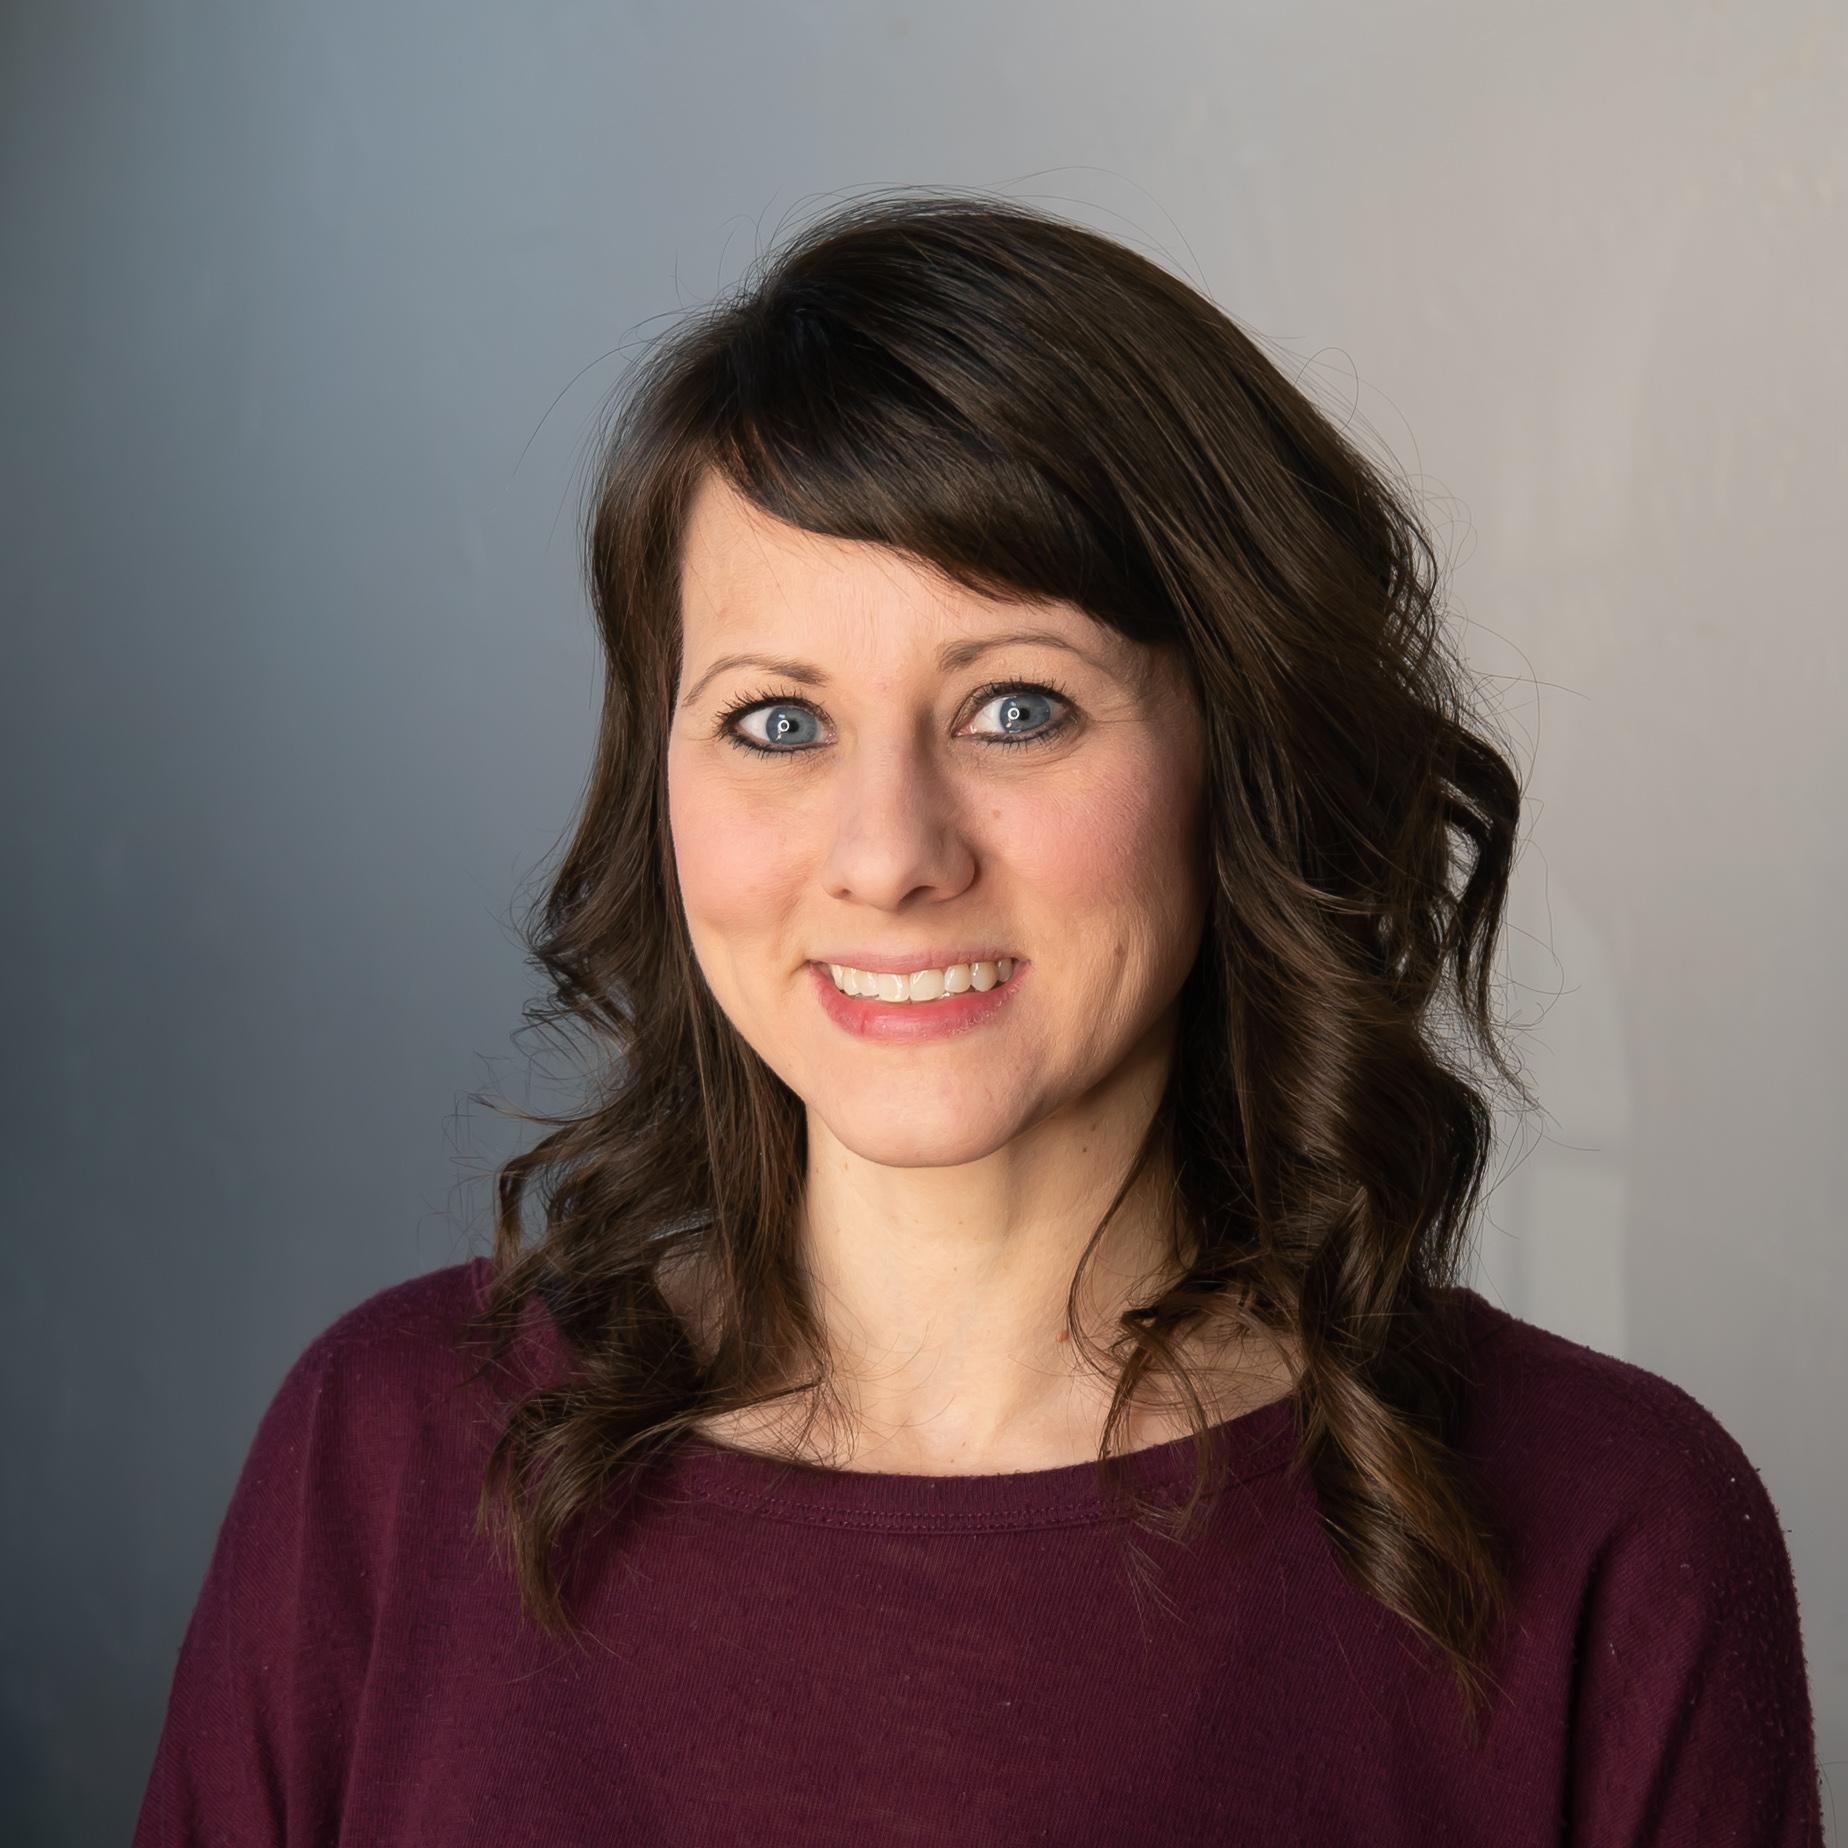 Melanie Moore | HCKIDS Assistant Director